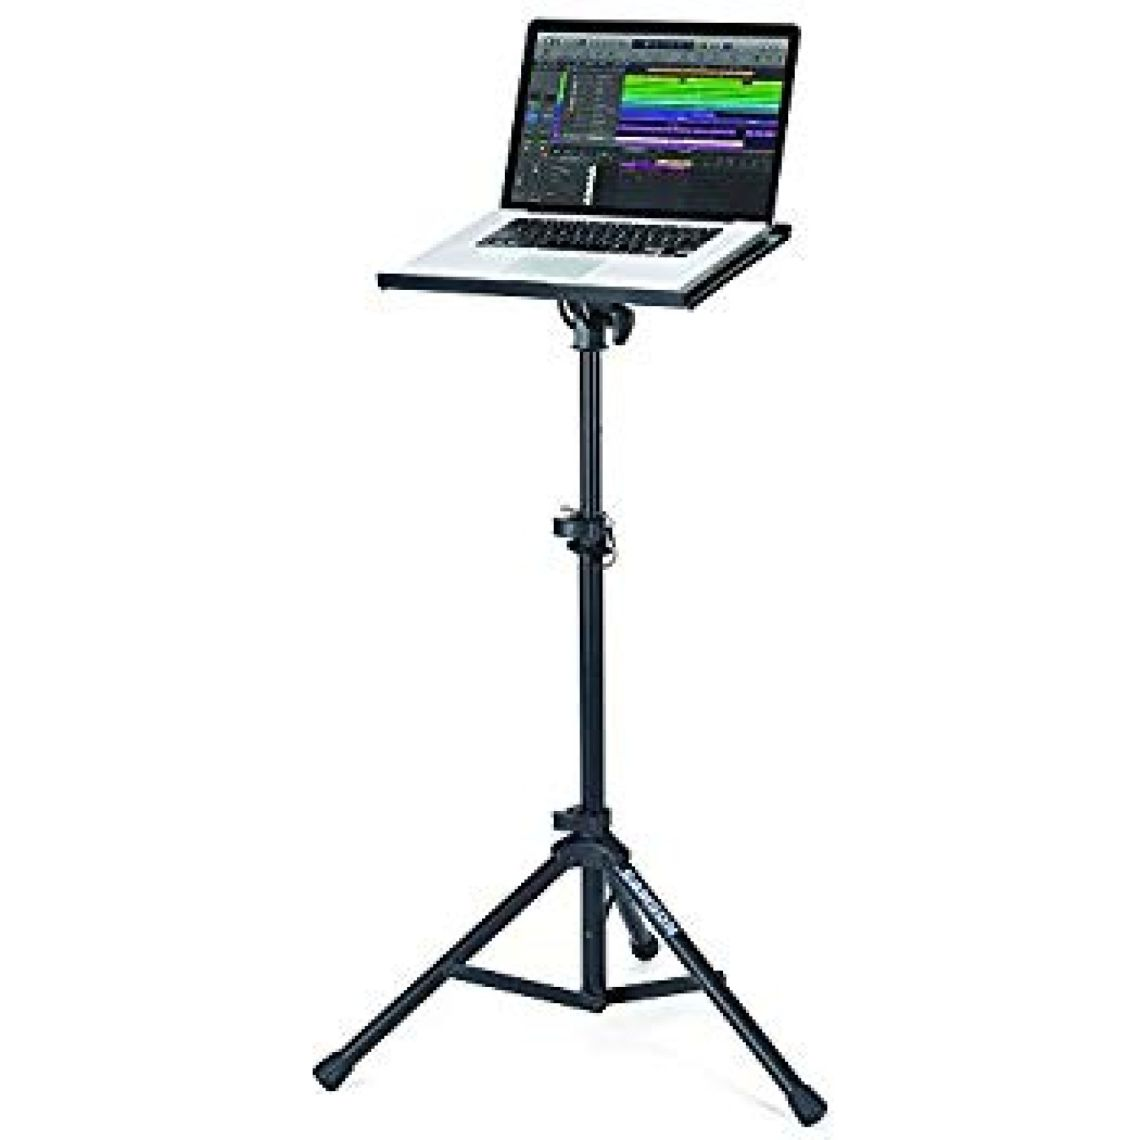 Amazon.com: Samson LTS50 Laptop Stand: Samson Audio: Musical Instruments